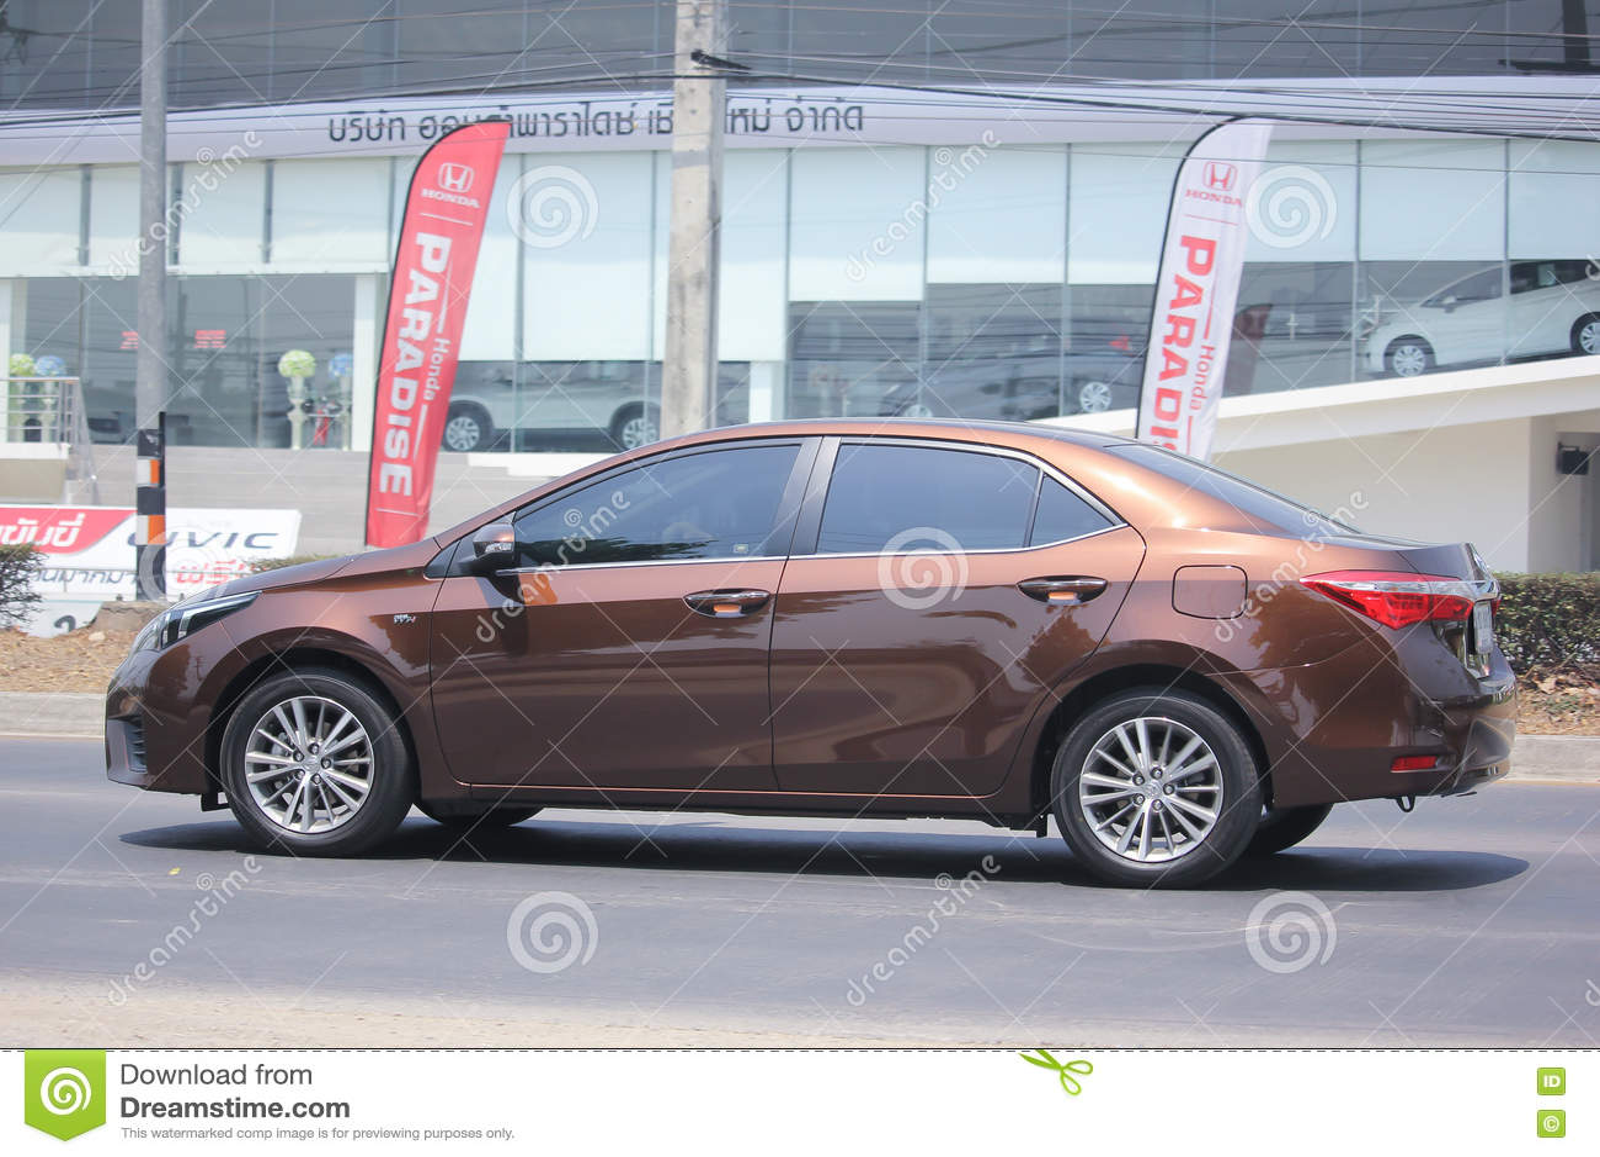 New Toyota Corolla Altis Editorial Photo Cartoondealer